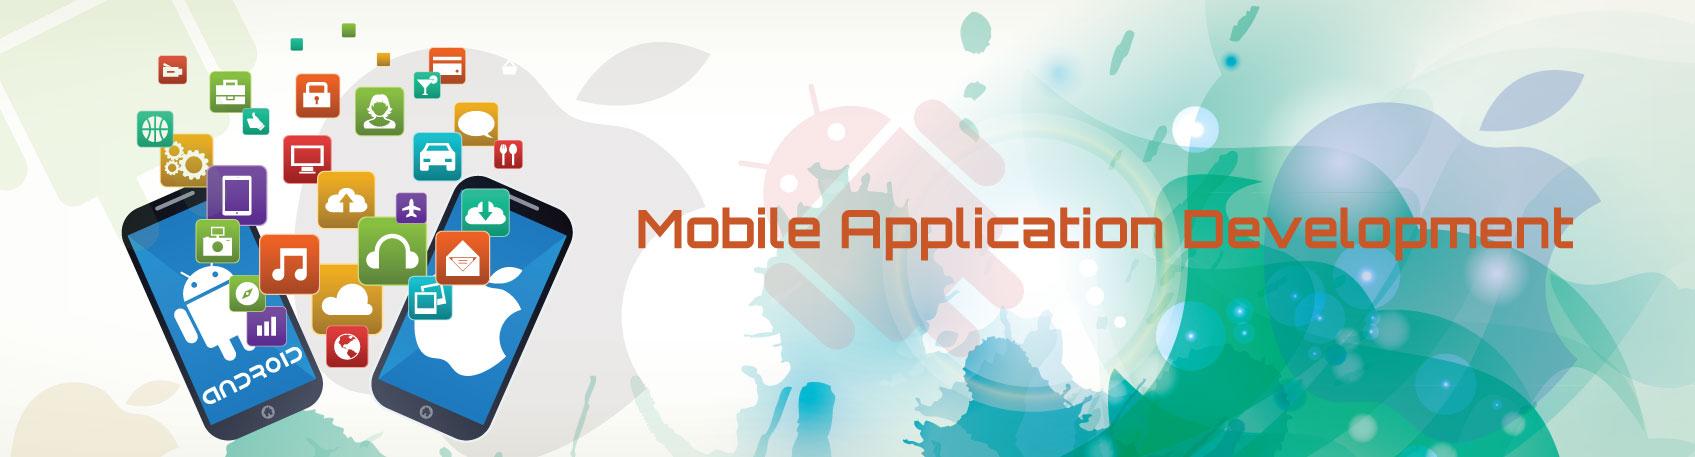 mobile-apps-banner1